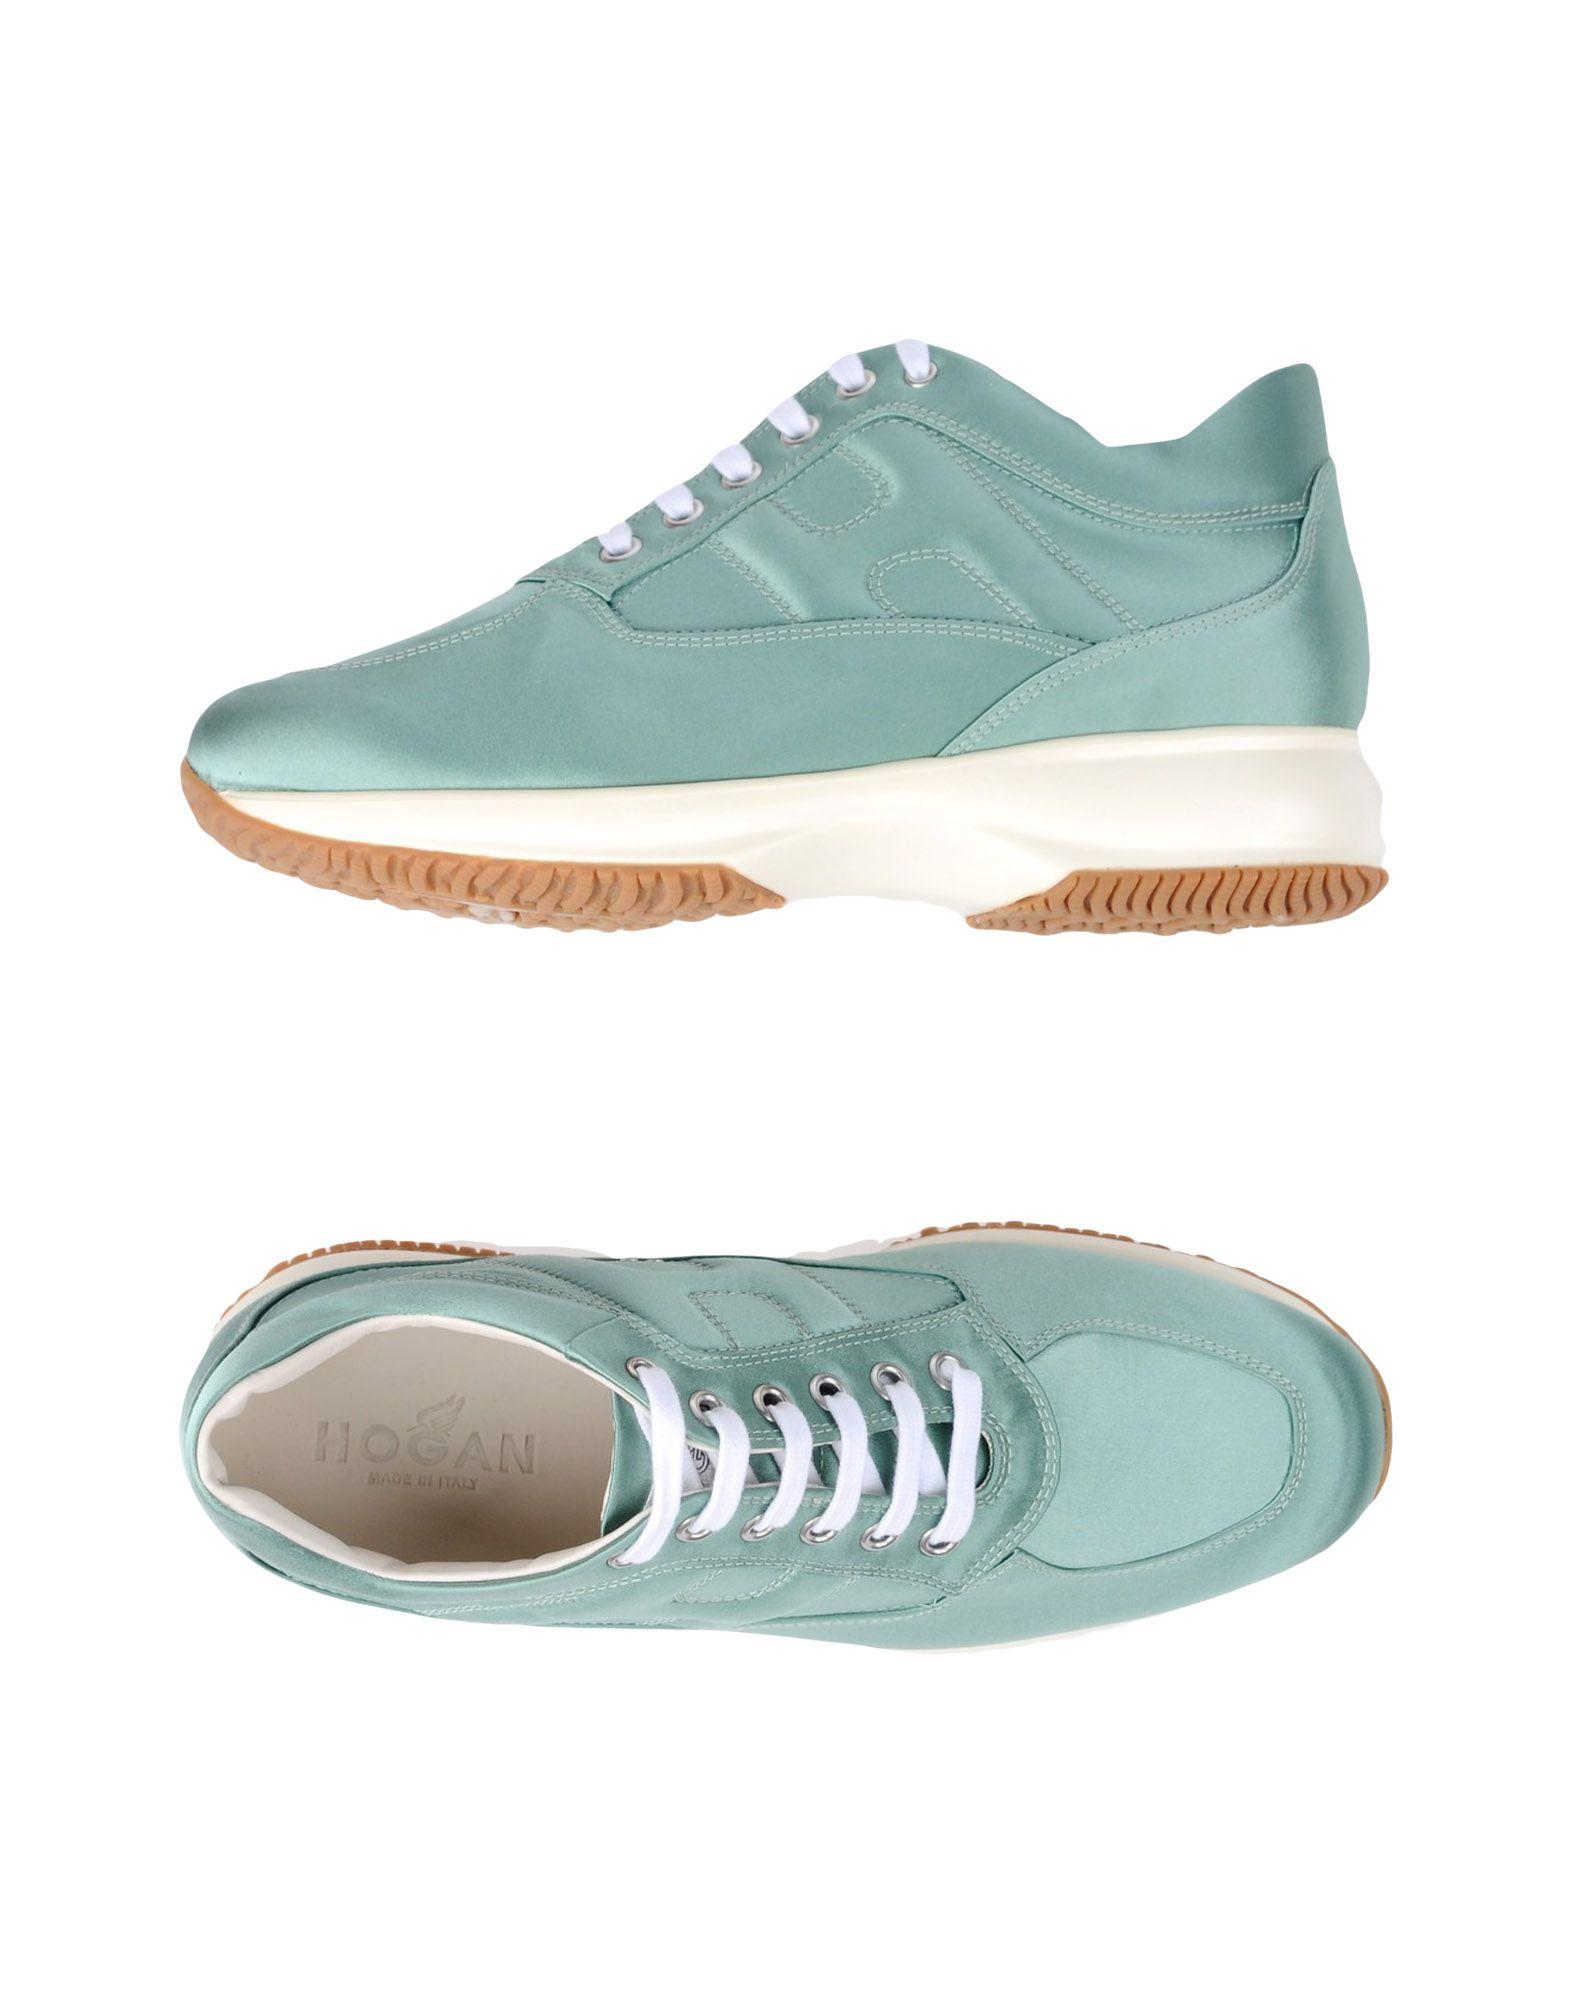 Hogan Sneakers Damen  11342366EEGut aussehende strapazierfähige Schuhe